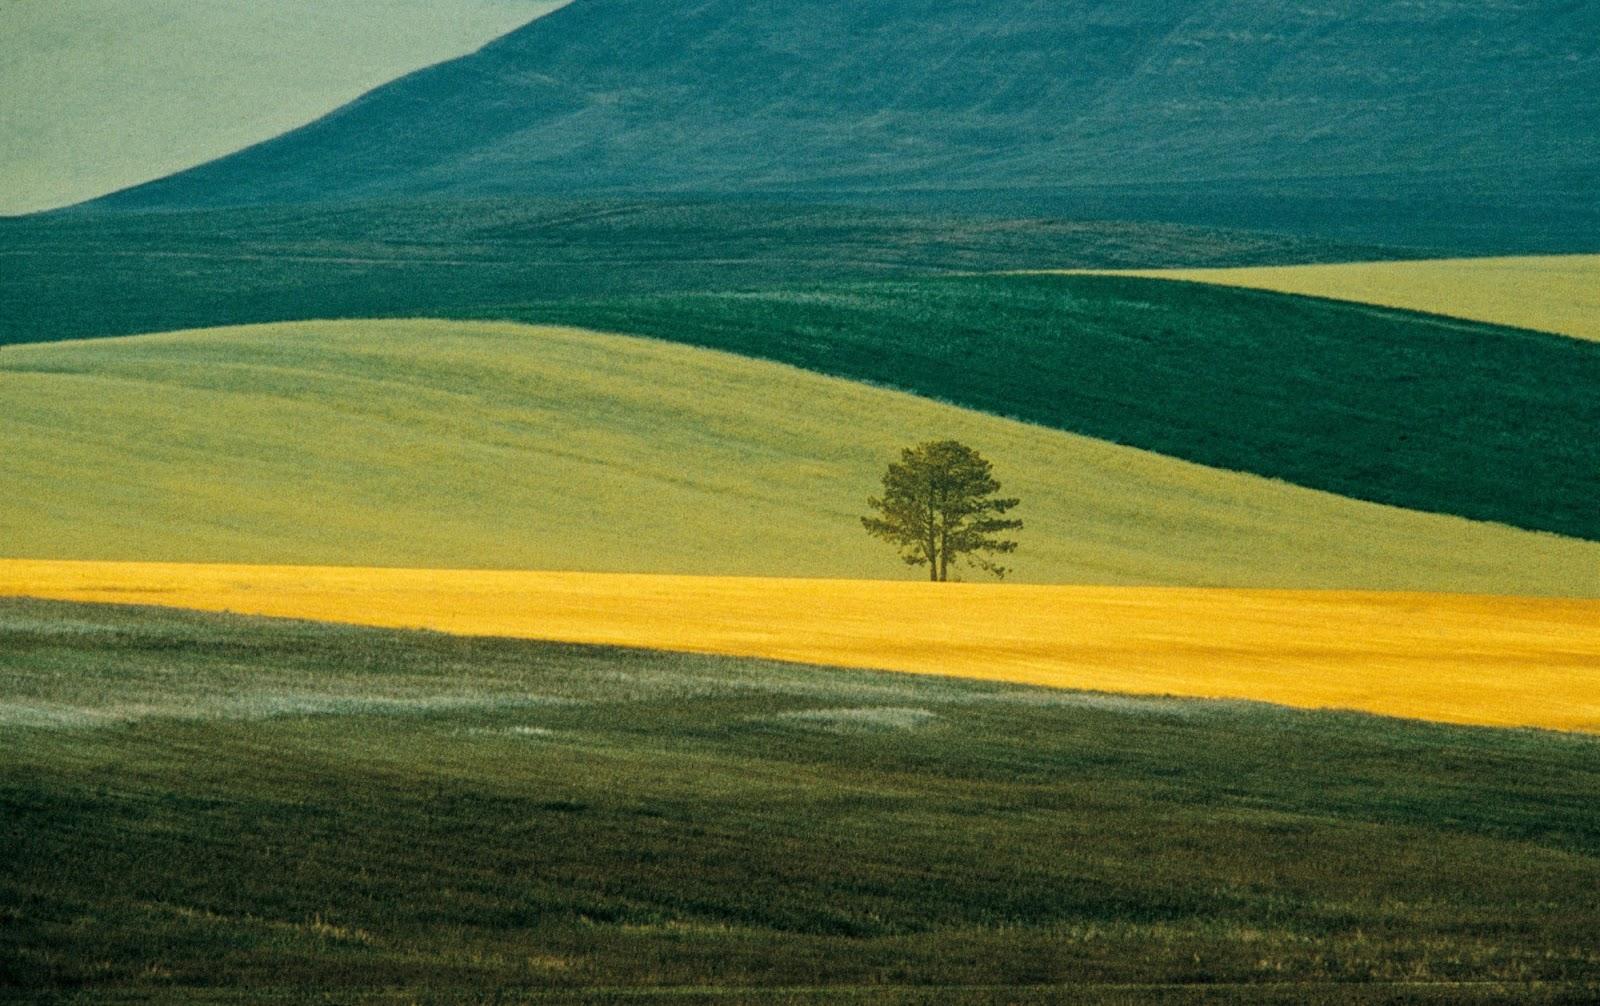 © Franco Fontana landscape photography